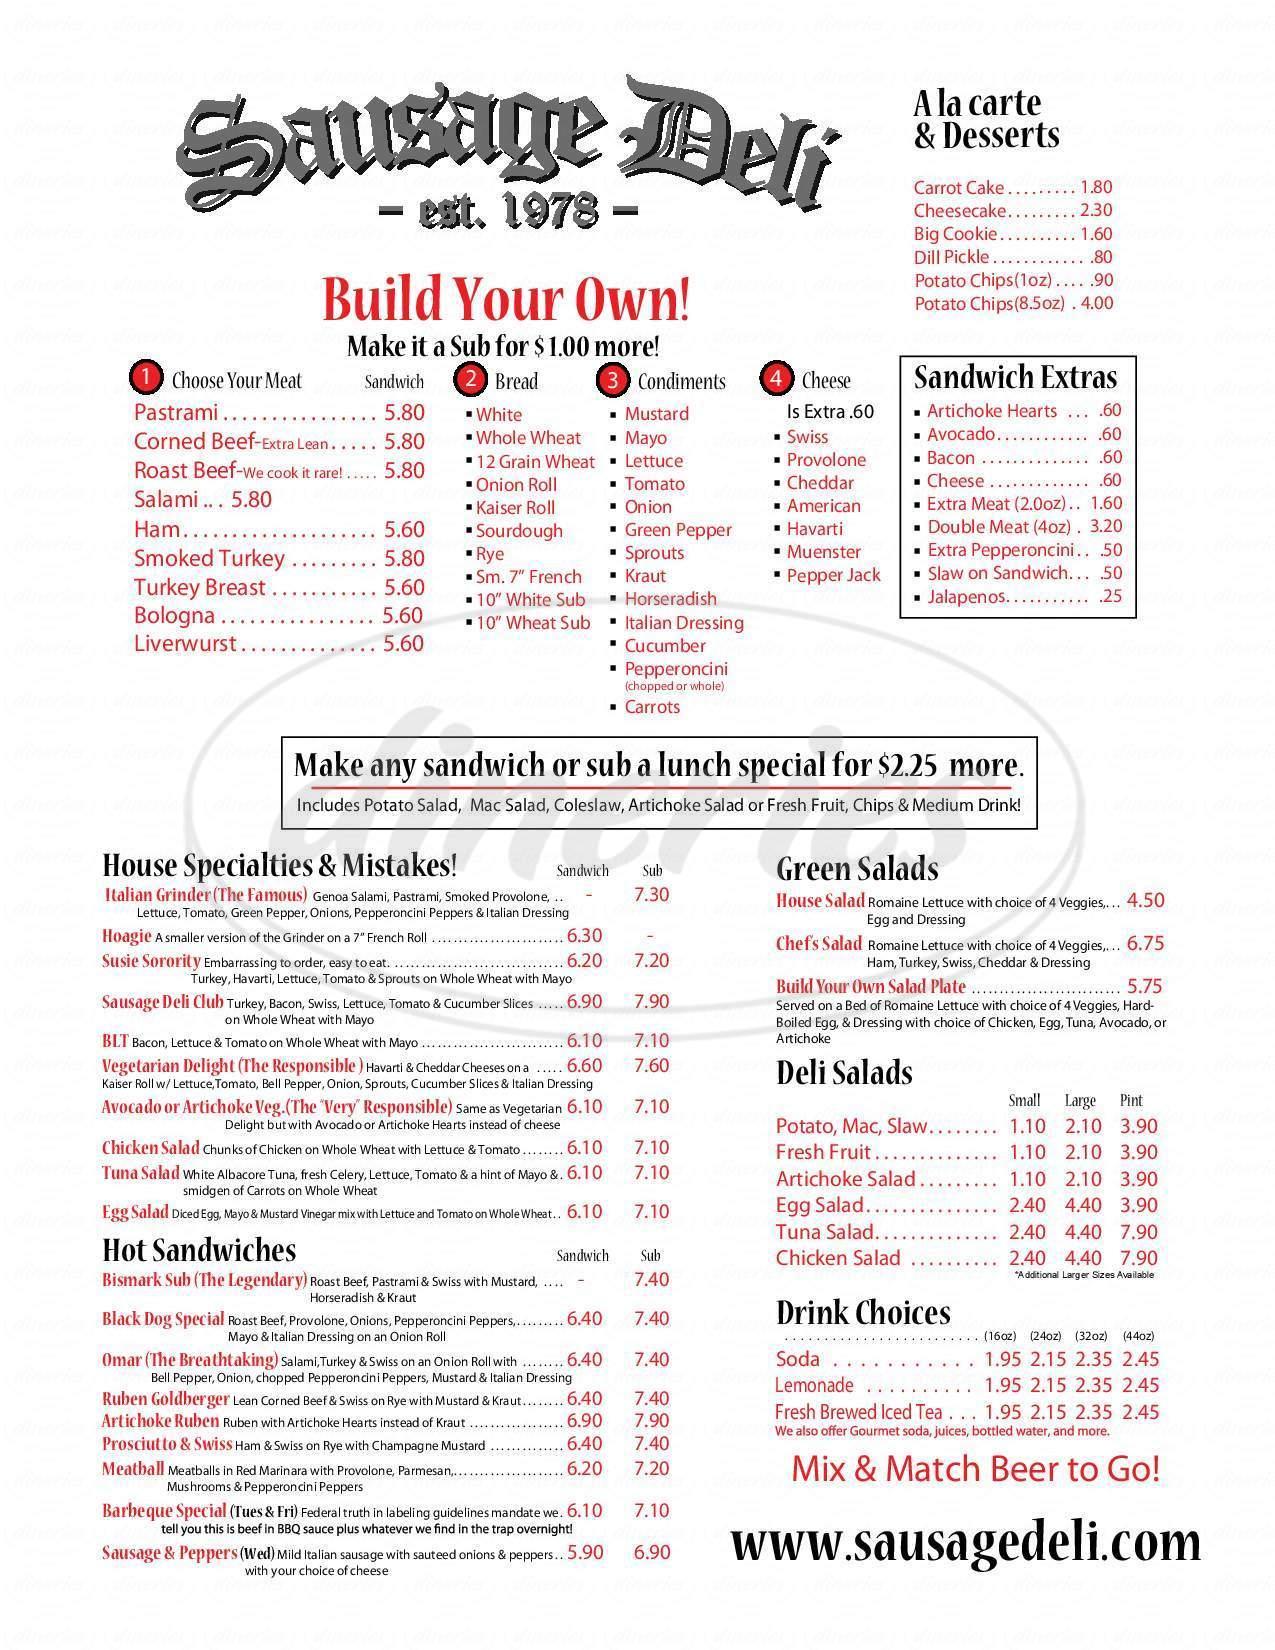 menu for Sausage Deli